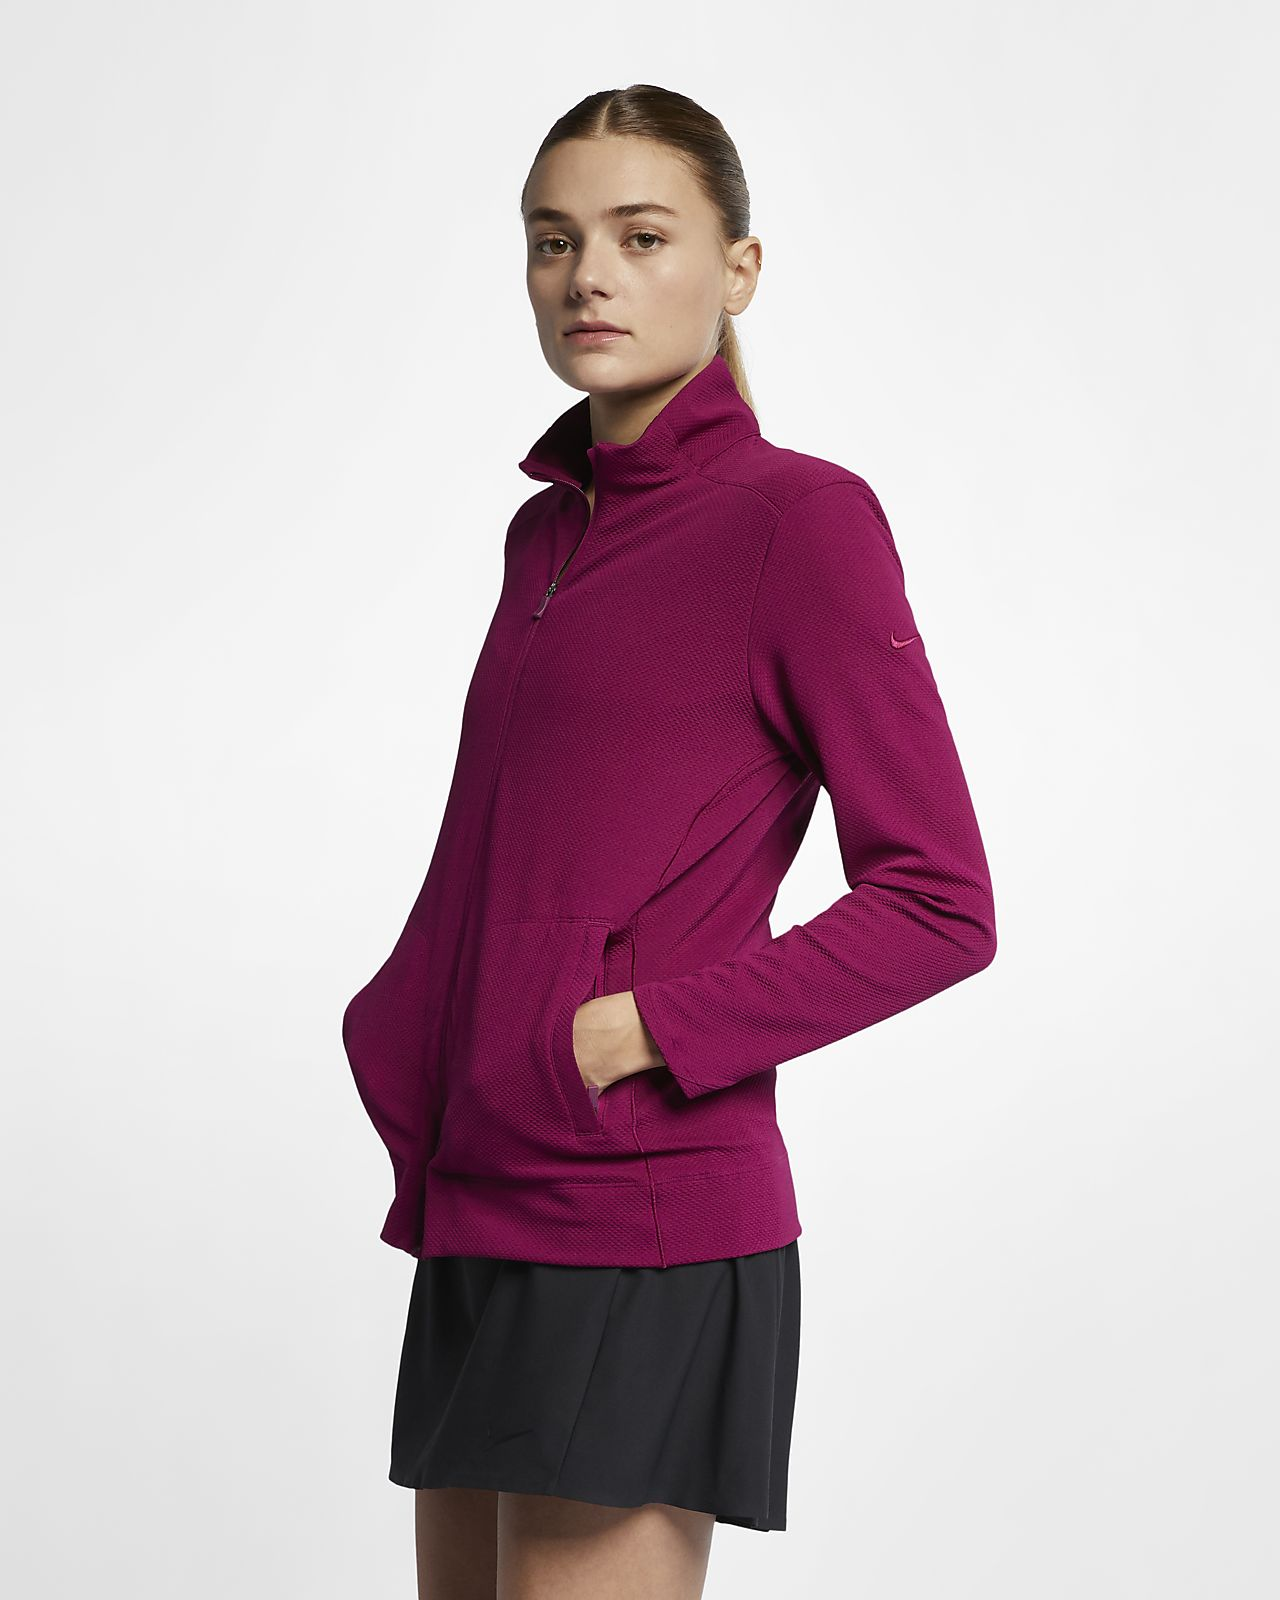 Nike Dri-FIT UV Damen-Golfjacke